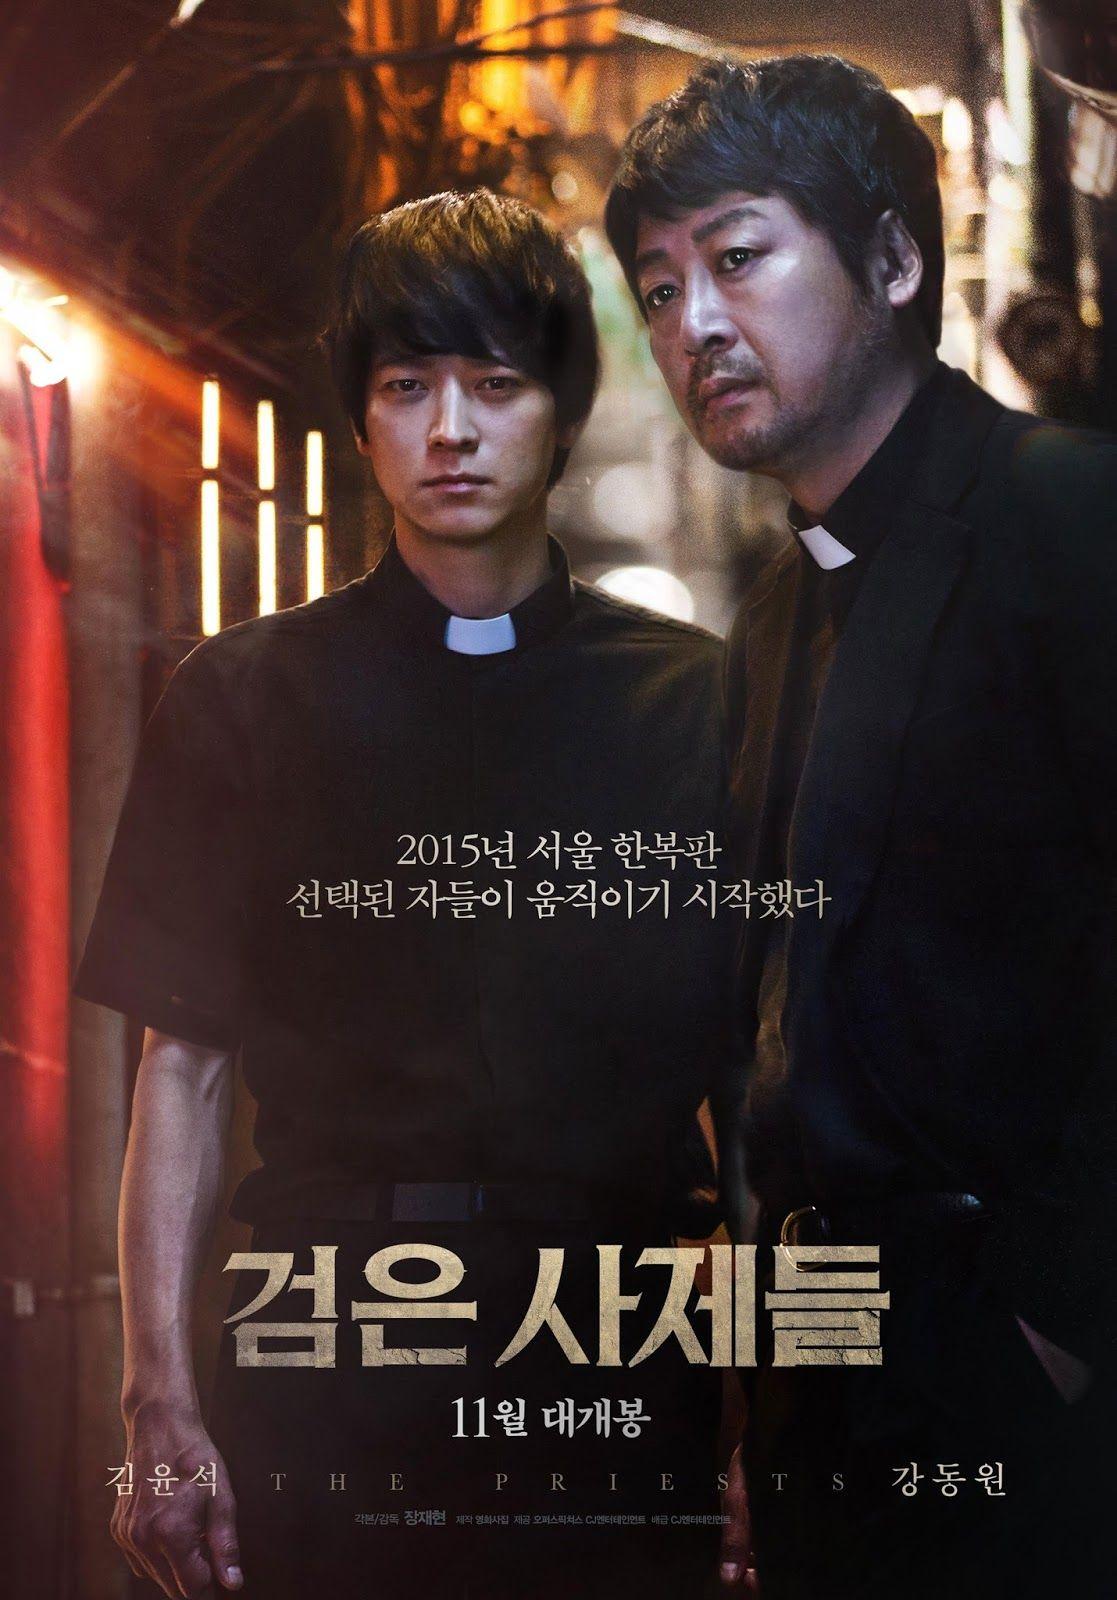 The Priest (2015) Subtitle Indonesia Películas completas